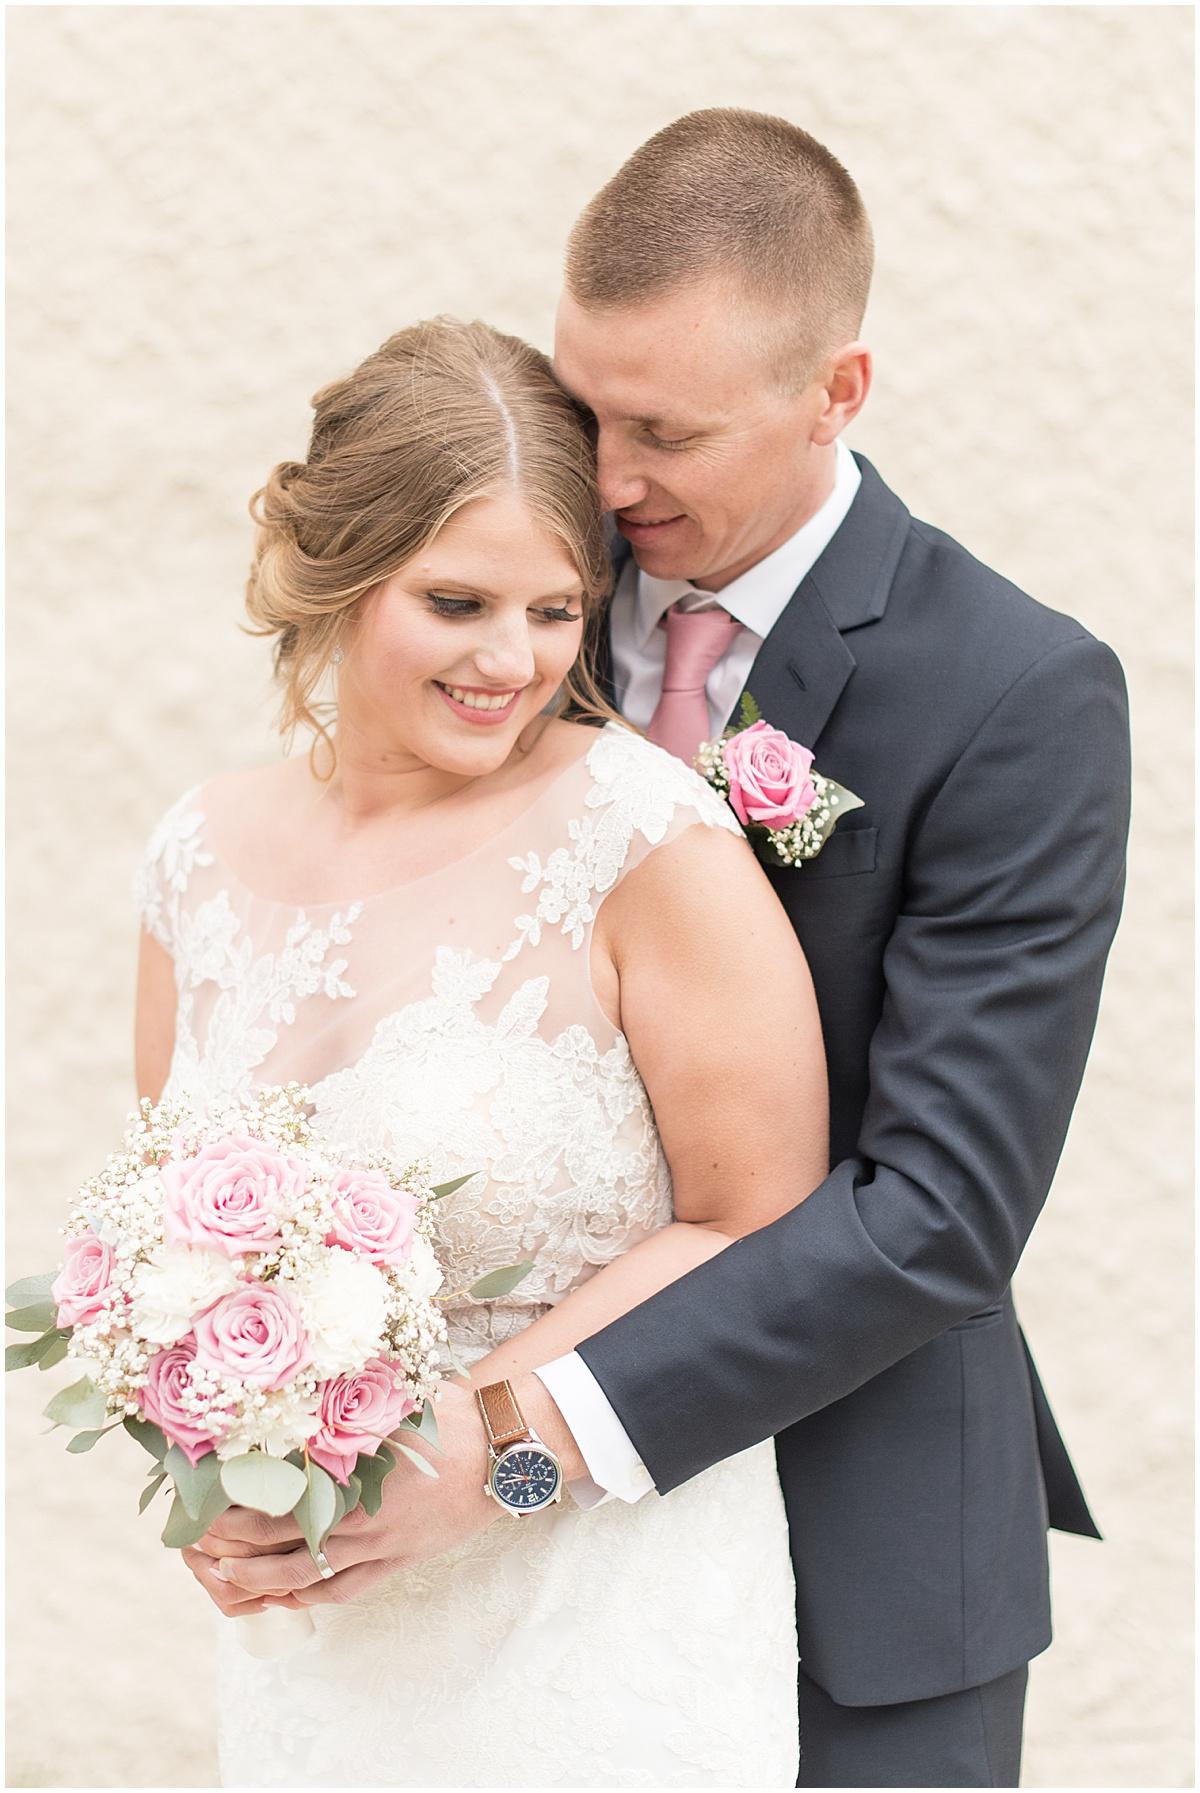 Anderson Wedding - Wedding in Berwyn Illinois 97.jpg